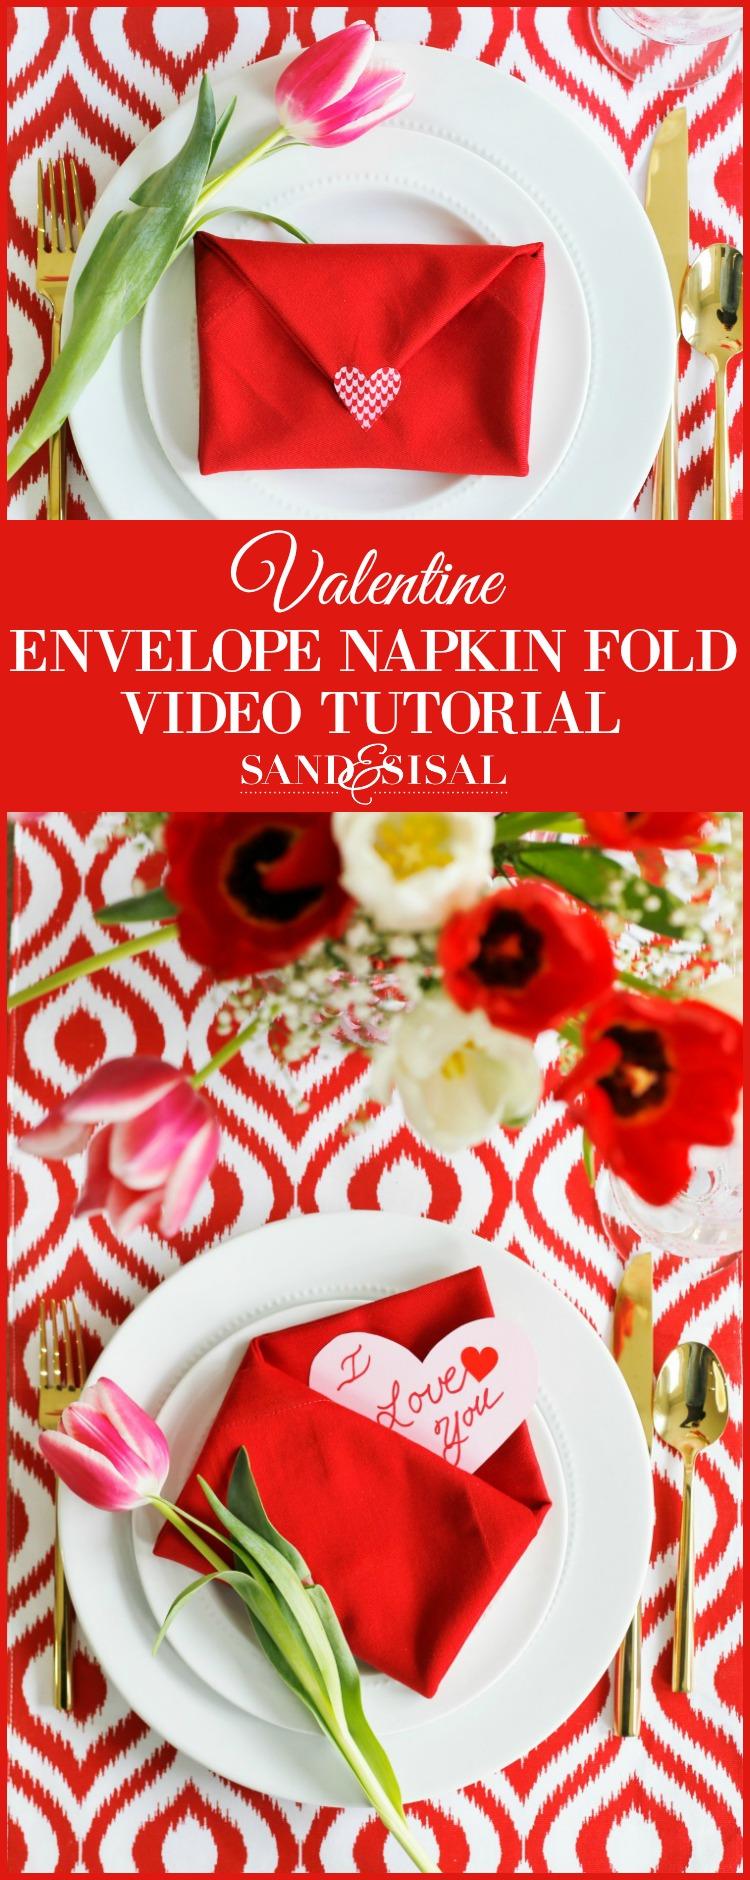 Valentine Envelope Napkin Fold Video Tutorial